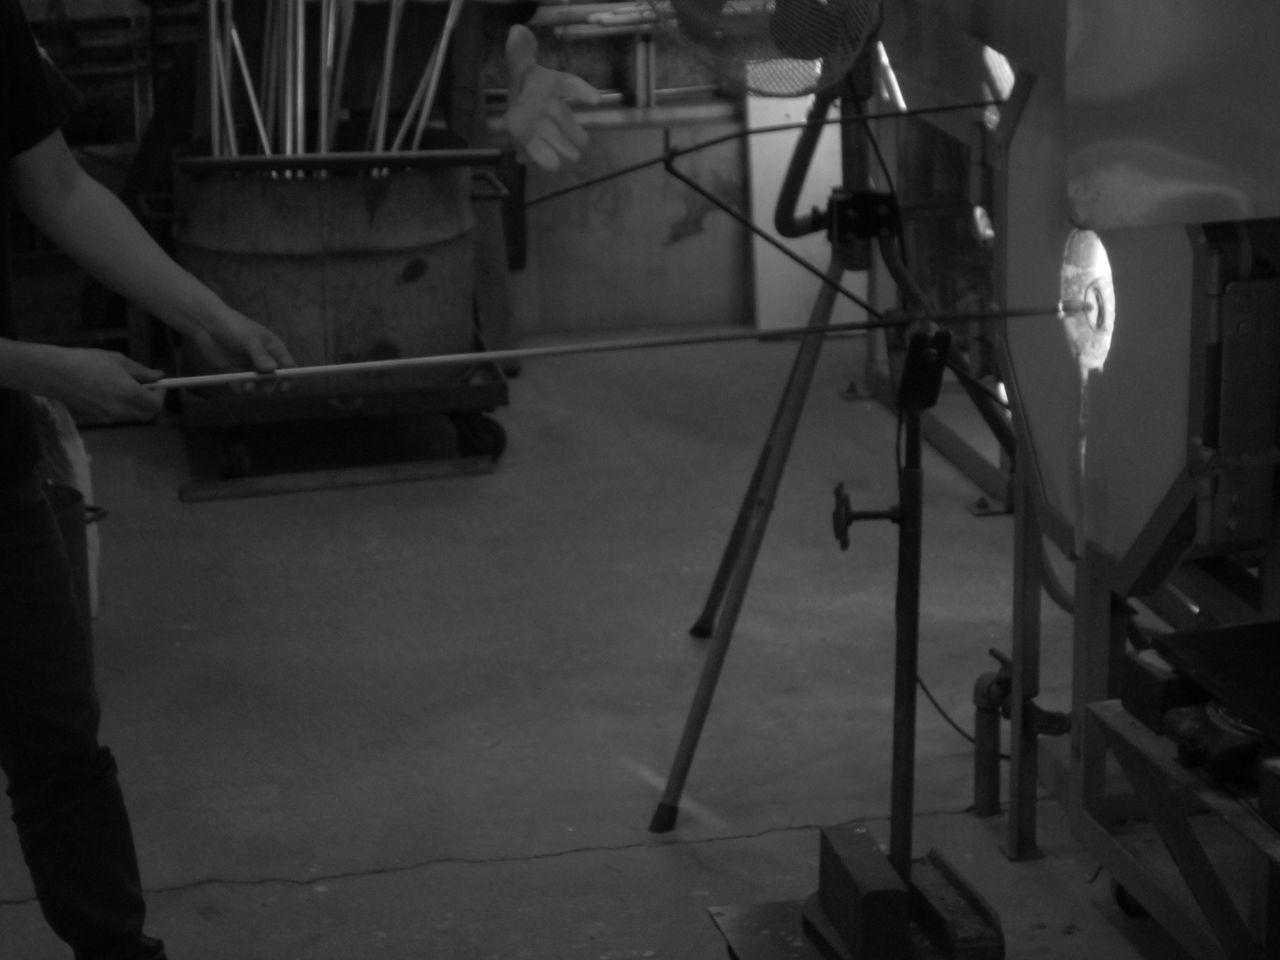 Glass Furnace Art Studio Artist Craft Furnace Glass Blowing Glass Making Labor Labour Kabe Glass Village Glass No Sato Kabe Glass Village Handmade Hand Made Artisian TCPM